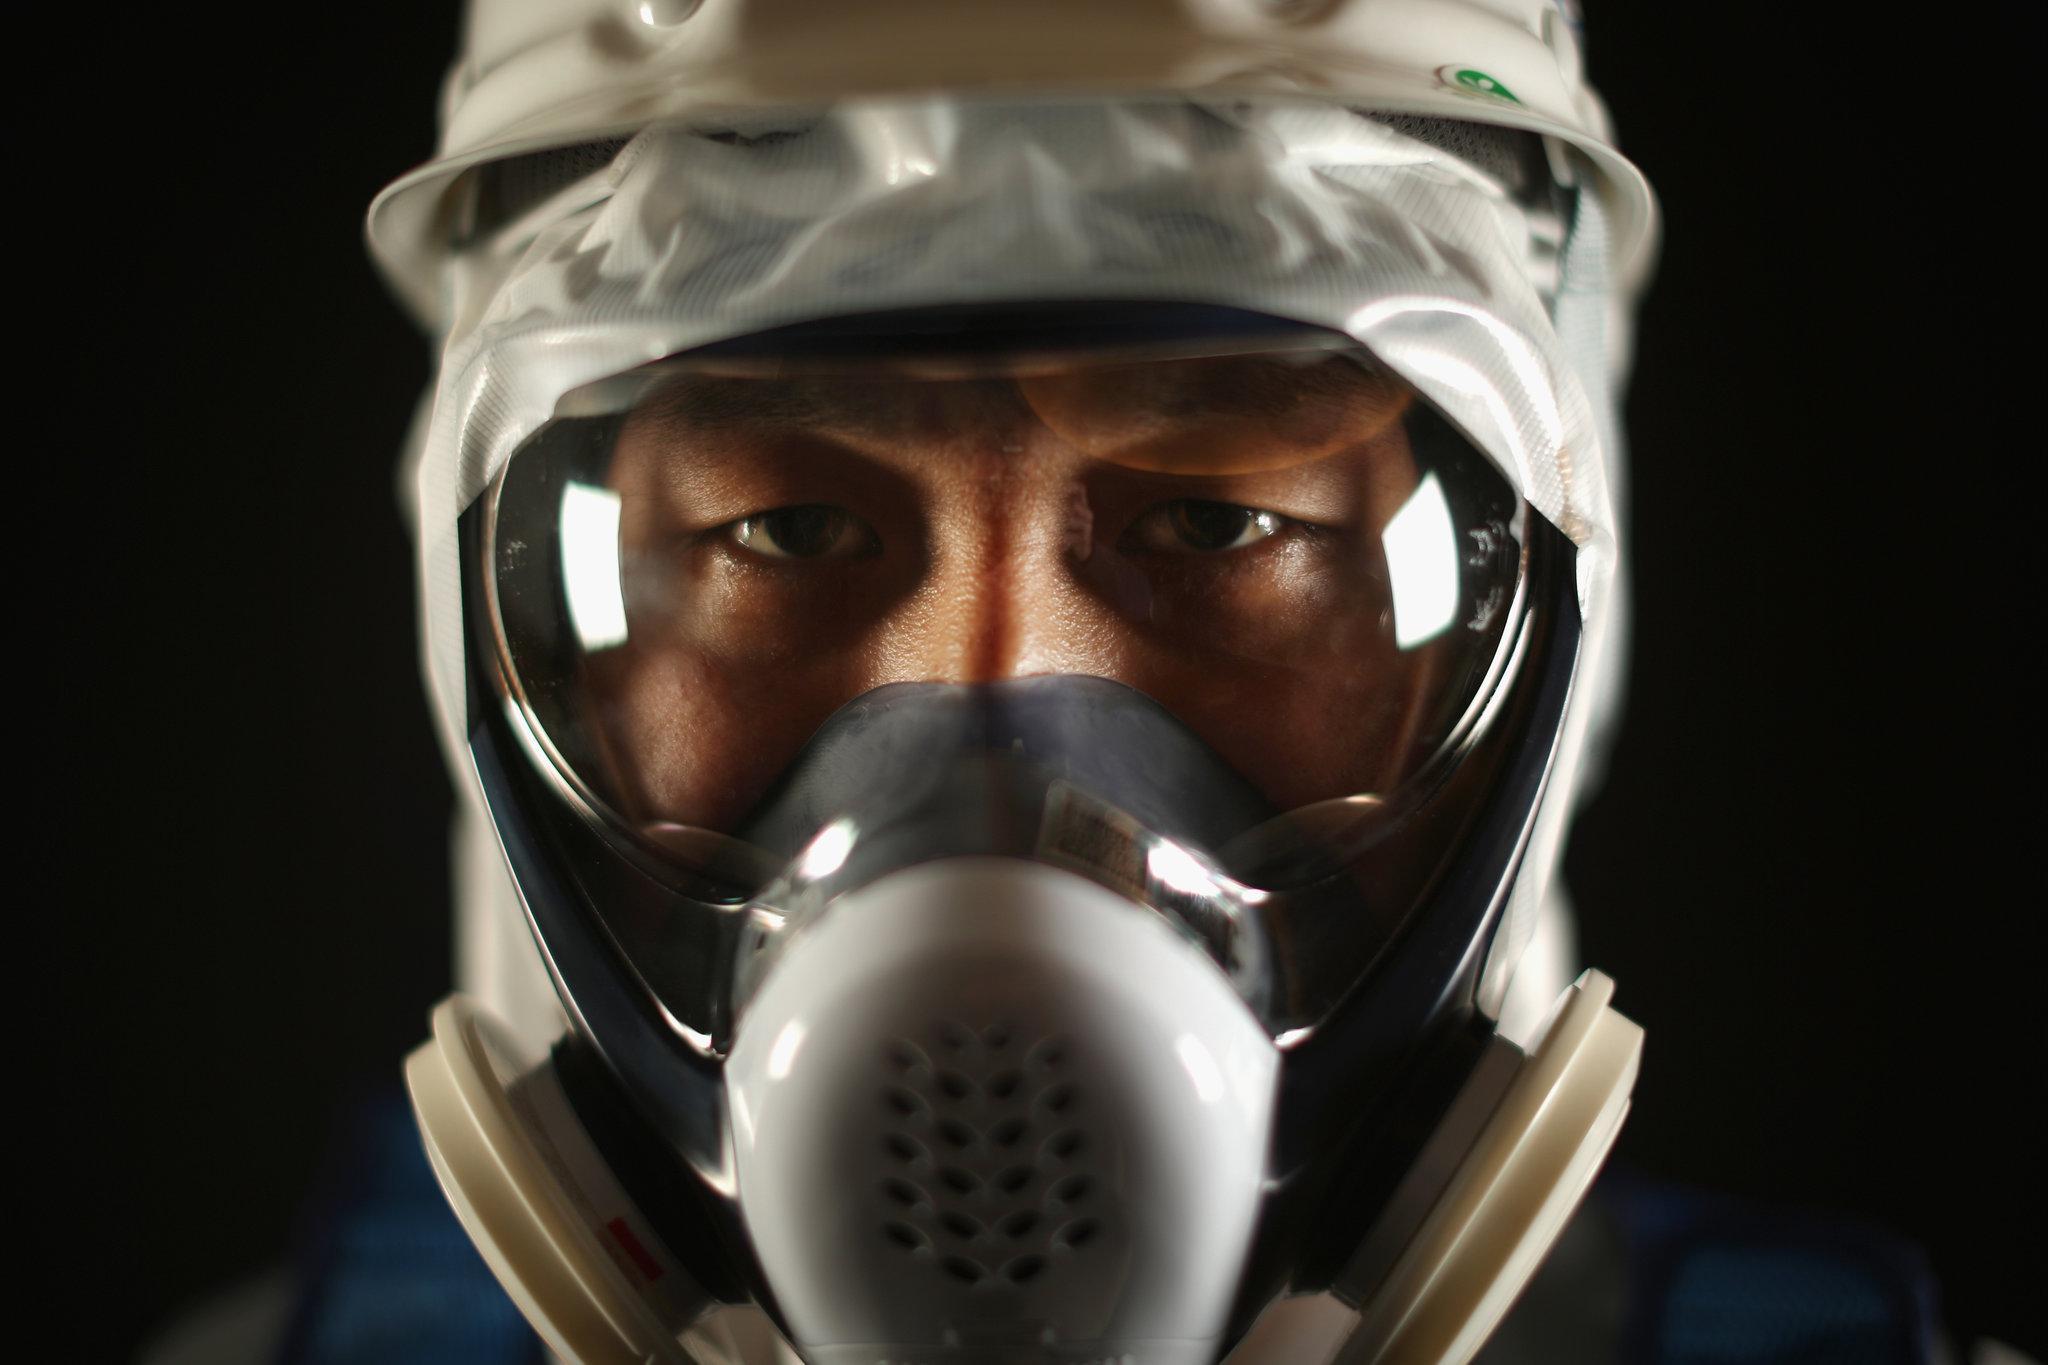 07fukushima-slide-07VQ-superJumbo